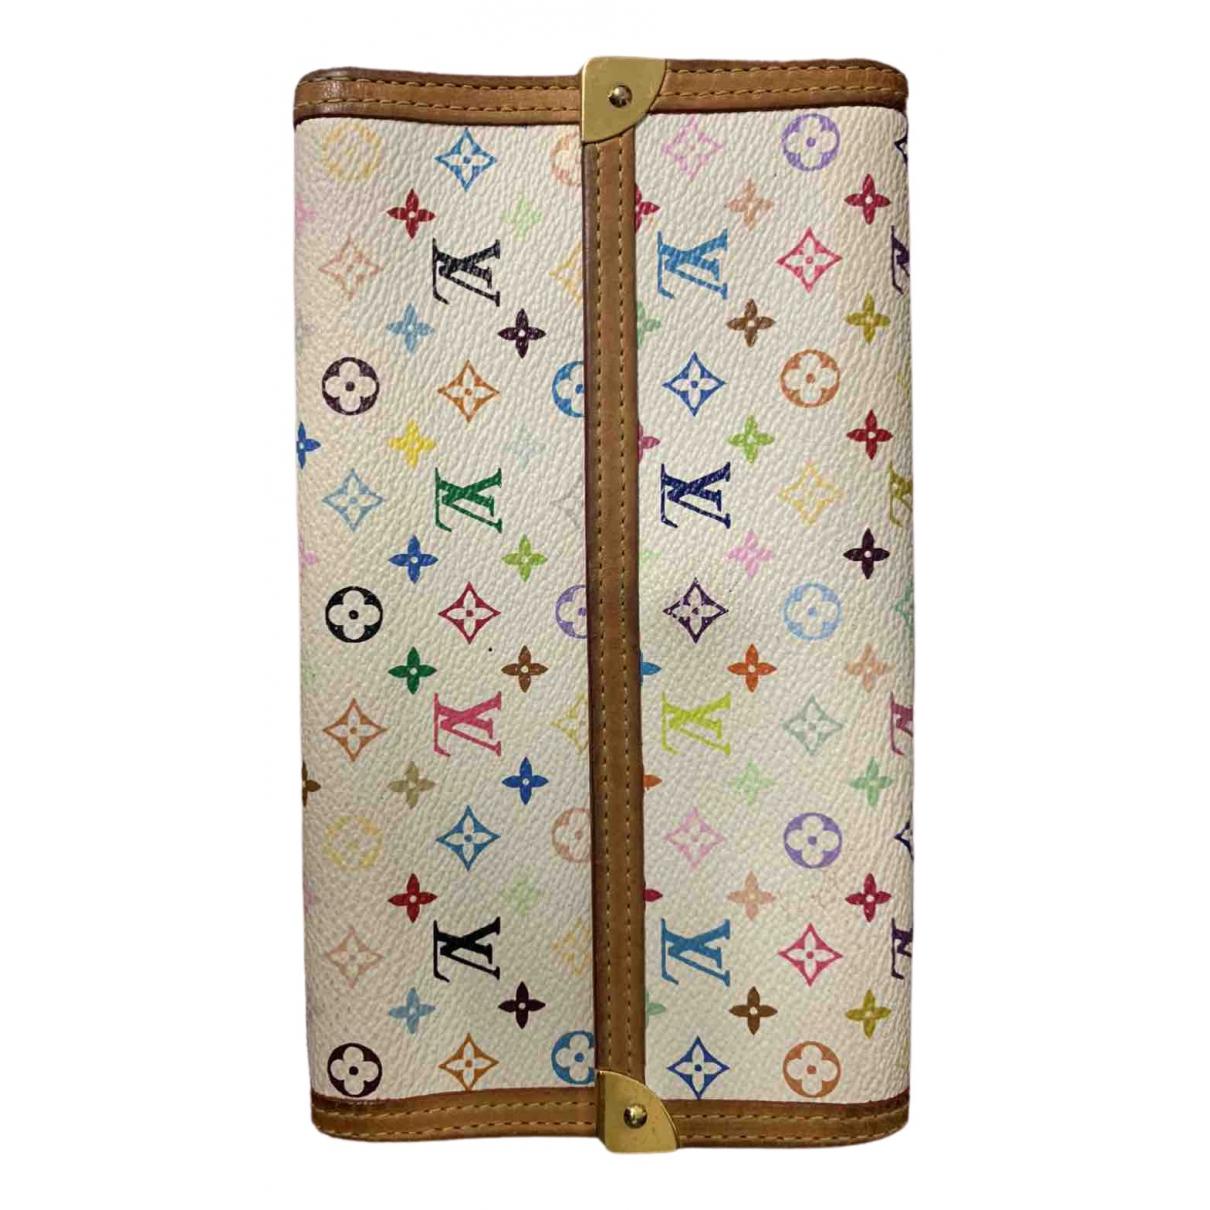 Louis Vuitton \N Multicolour Cloth wallet for Women \N